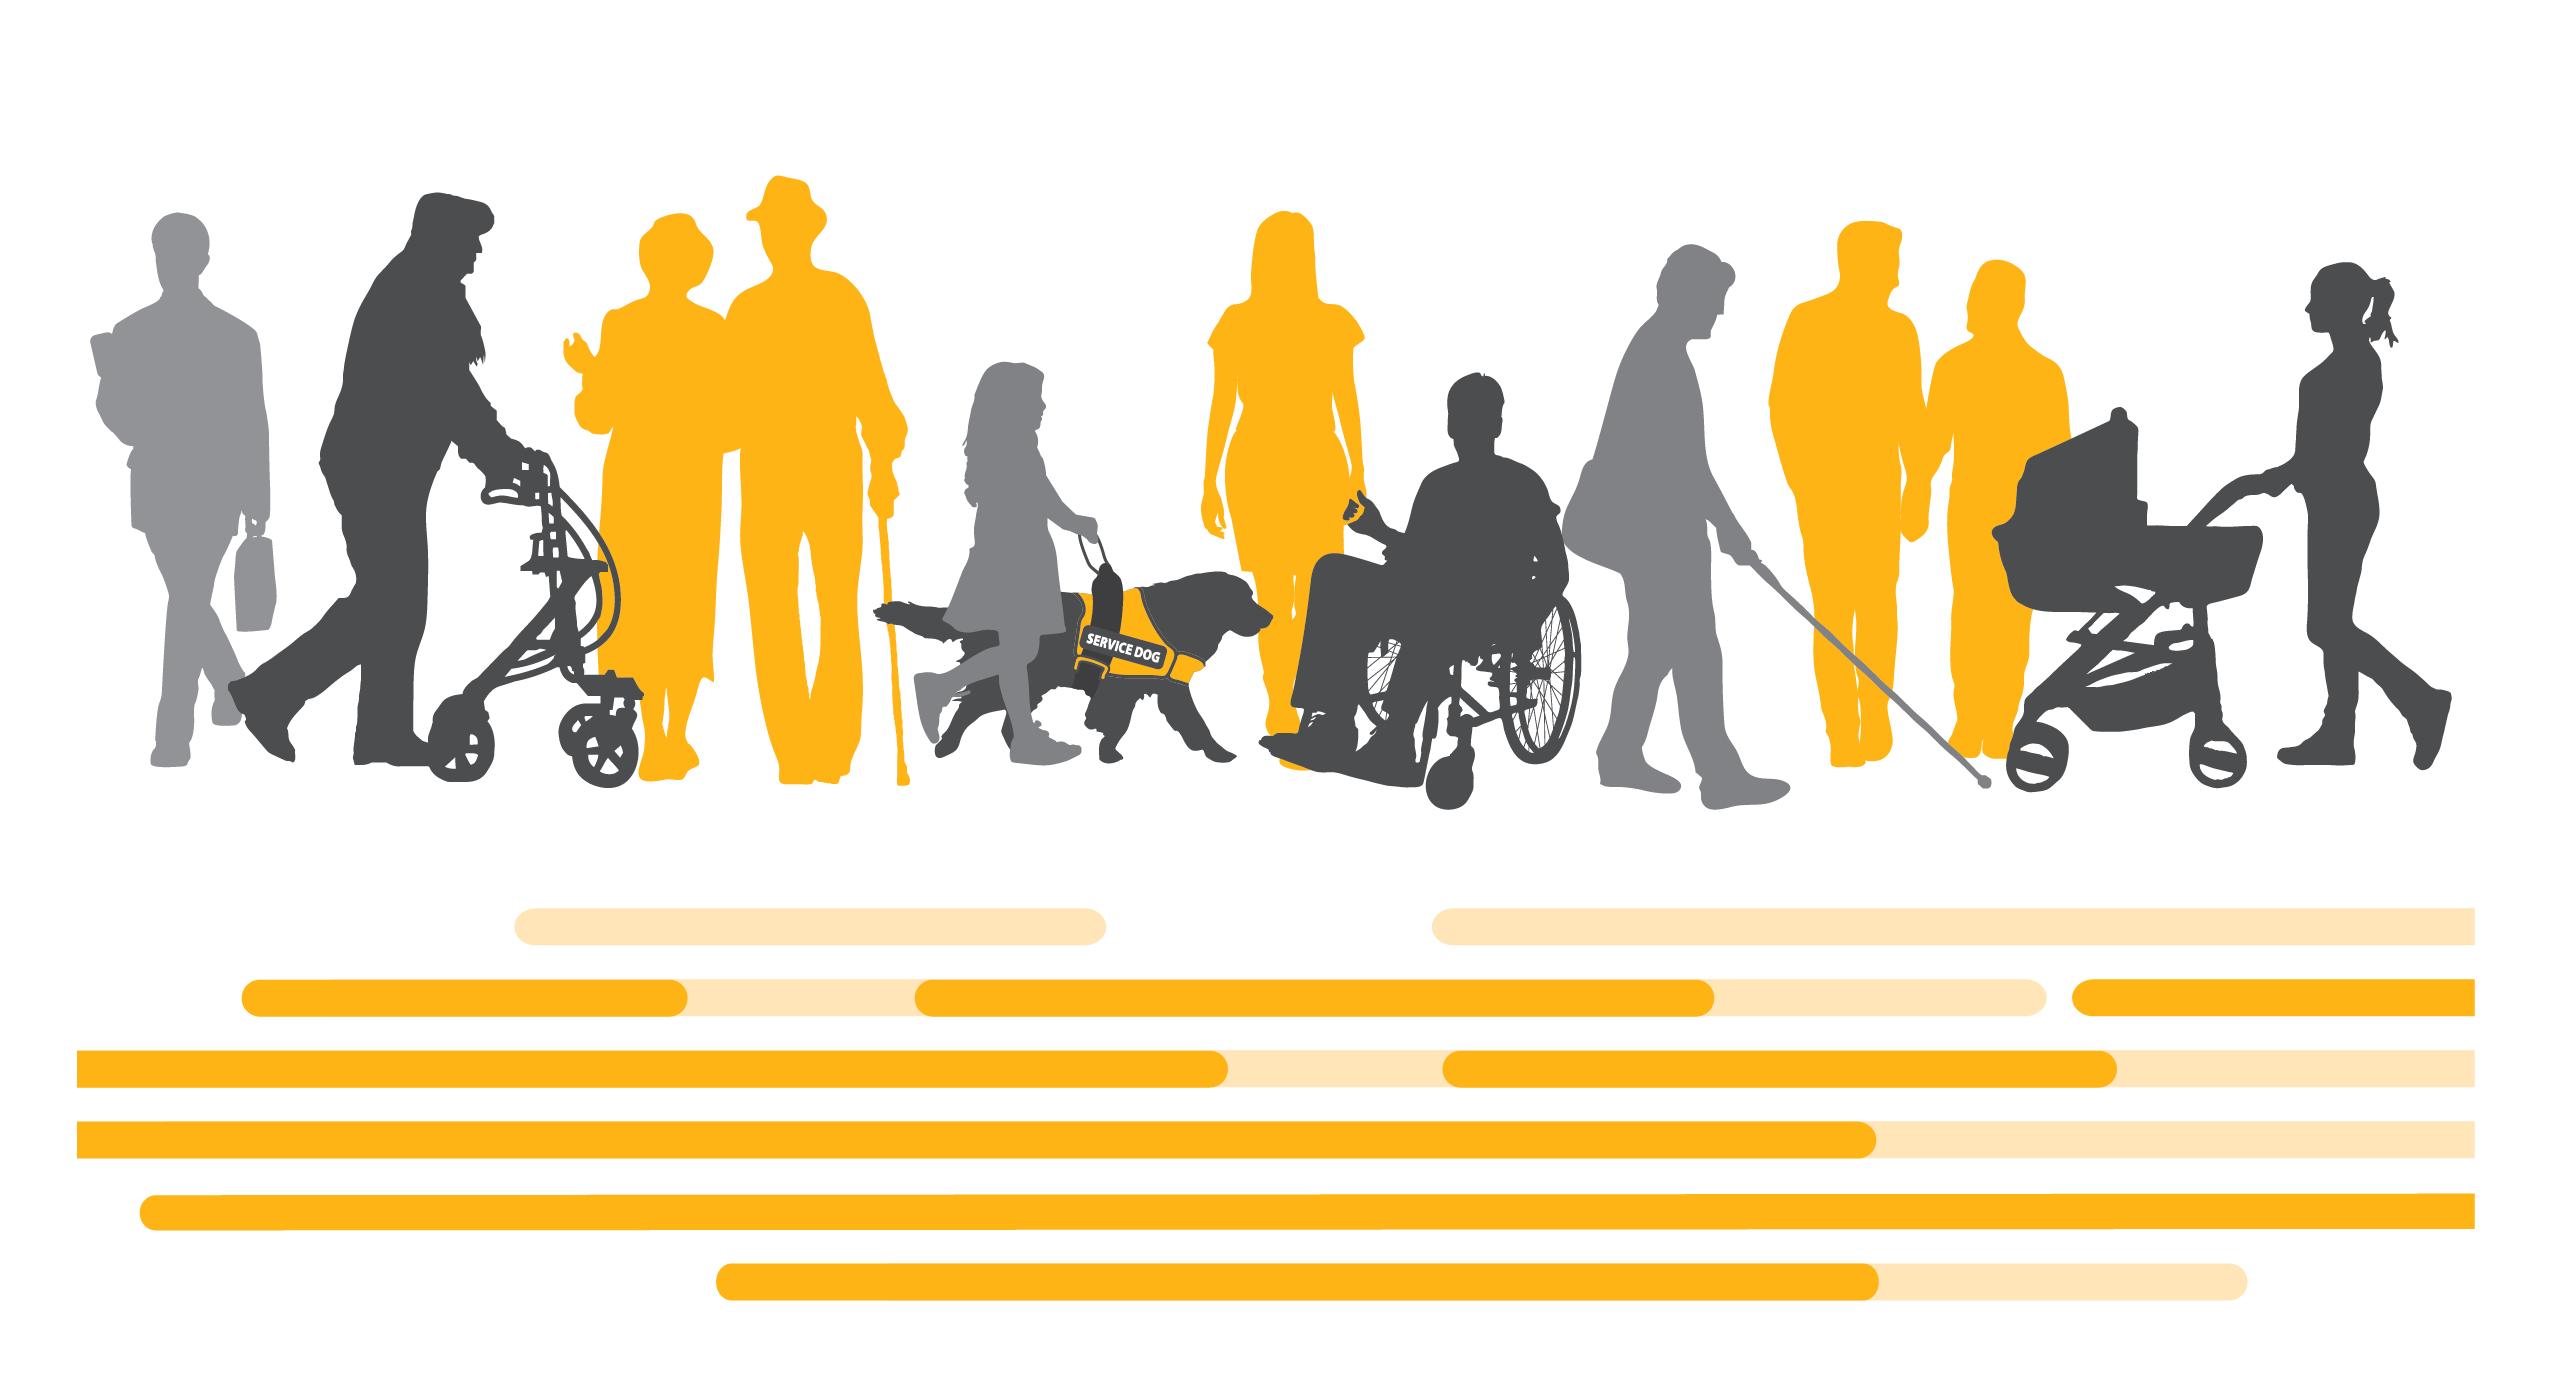 Accessibility Legislation Consultations